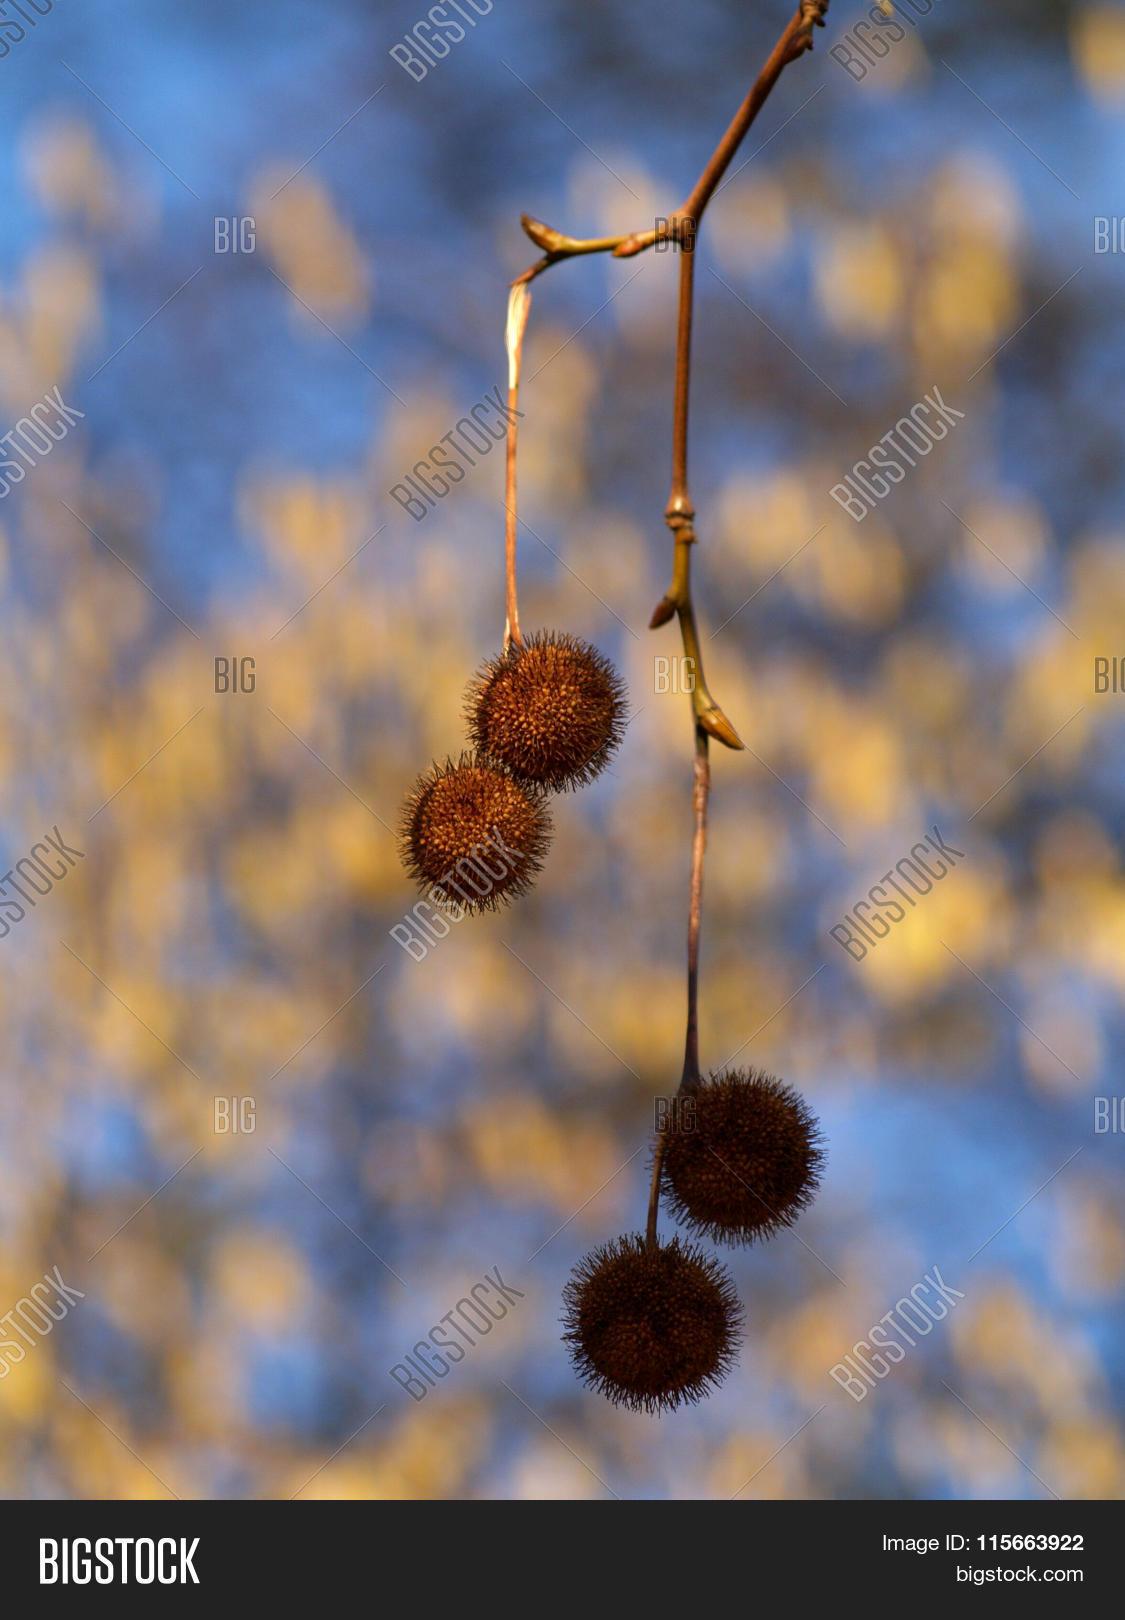 Seed Ball Plane Tree Image & Photo (Free Trial)   Bigstock